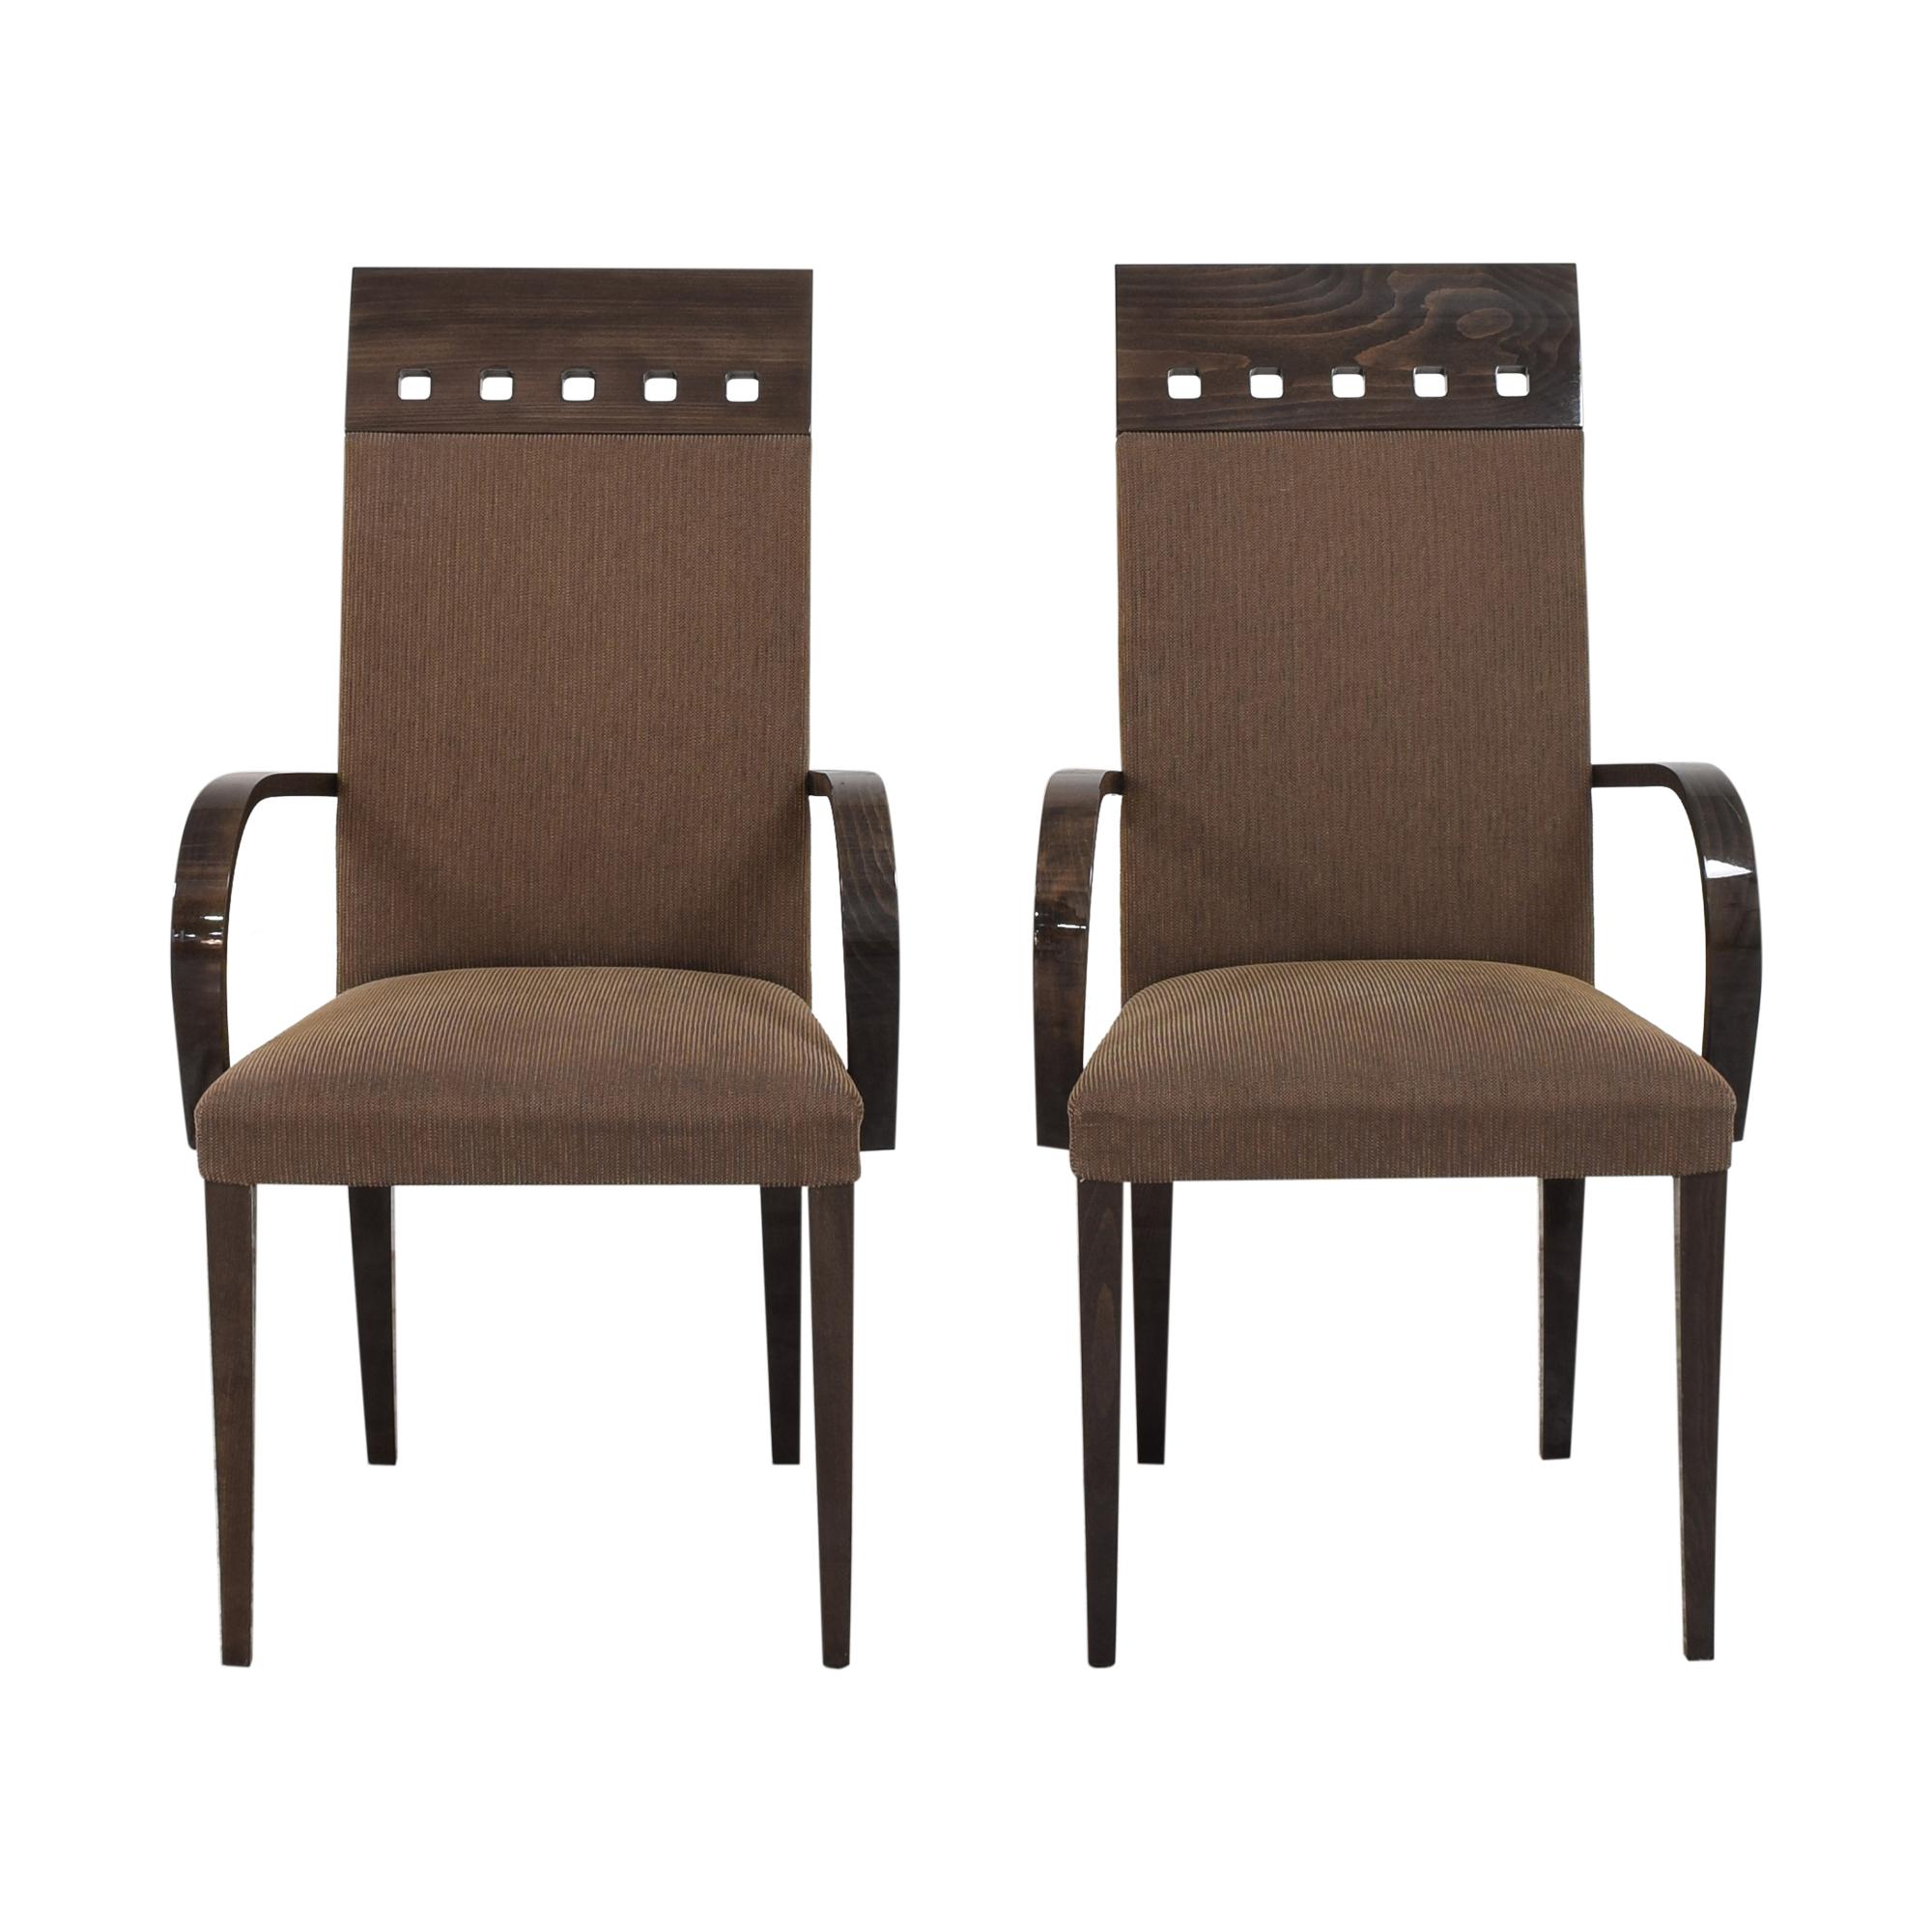 shop Pietro Costantini High Back Dining Arm Chairs Pietro Costantini Dining Chairs